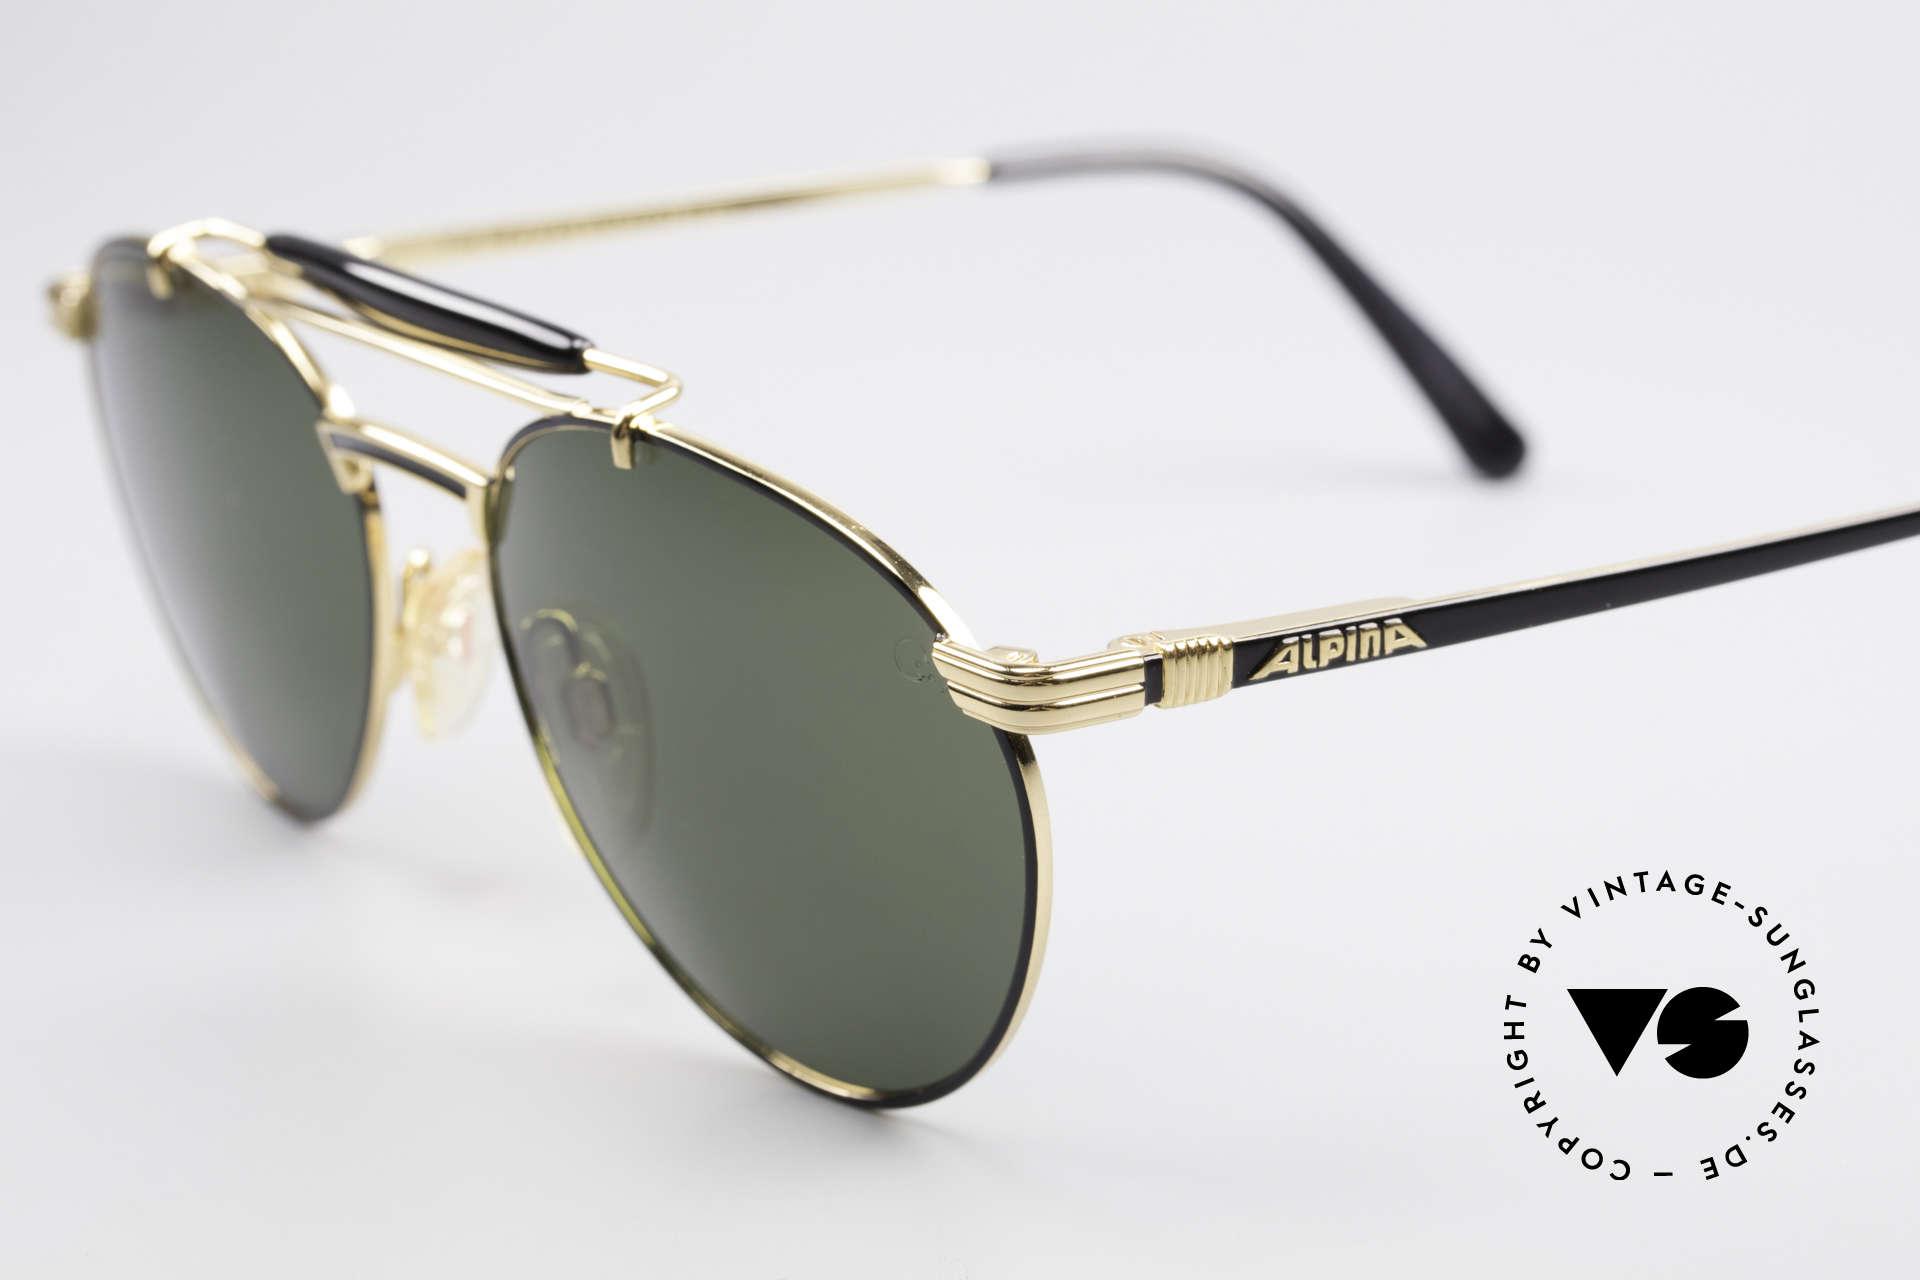 2e8e9004e6 Sunglasses Alpina THE NEW MAN Rare 90 s Aviator Sunglasses